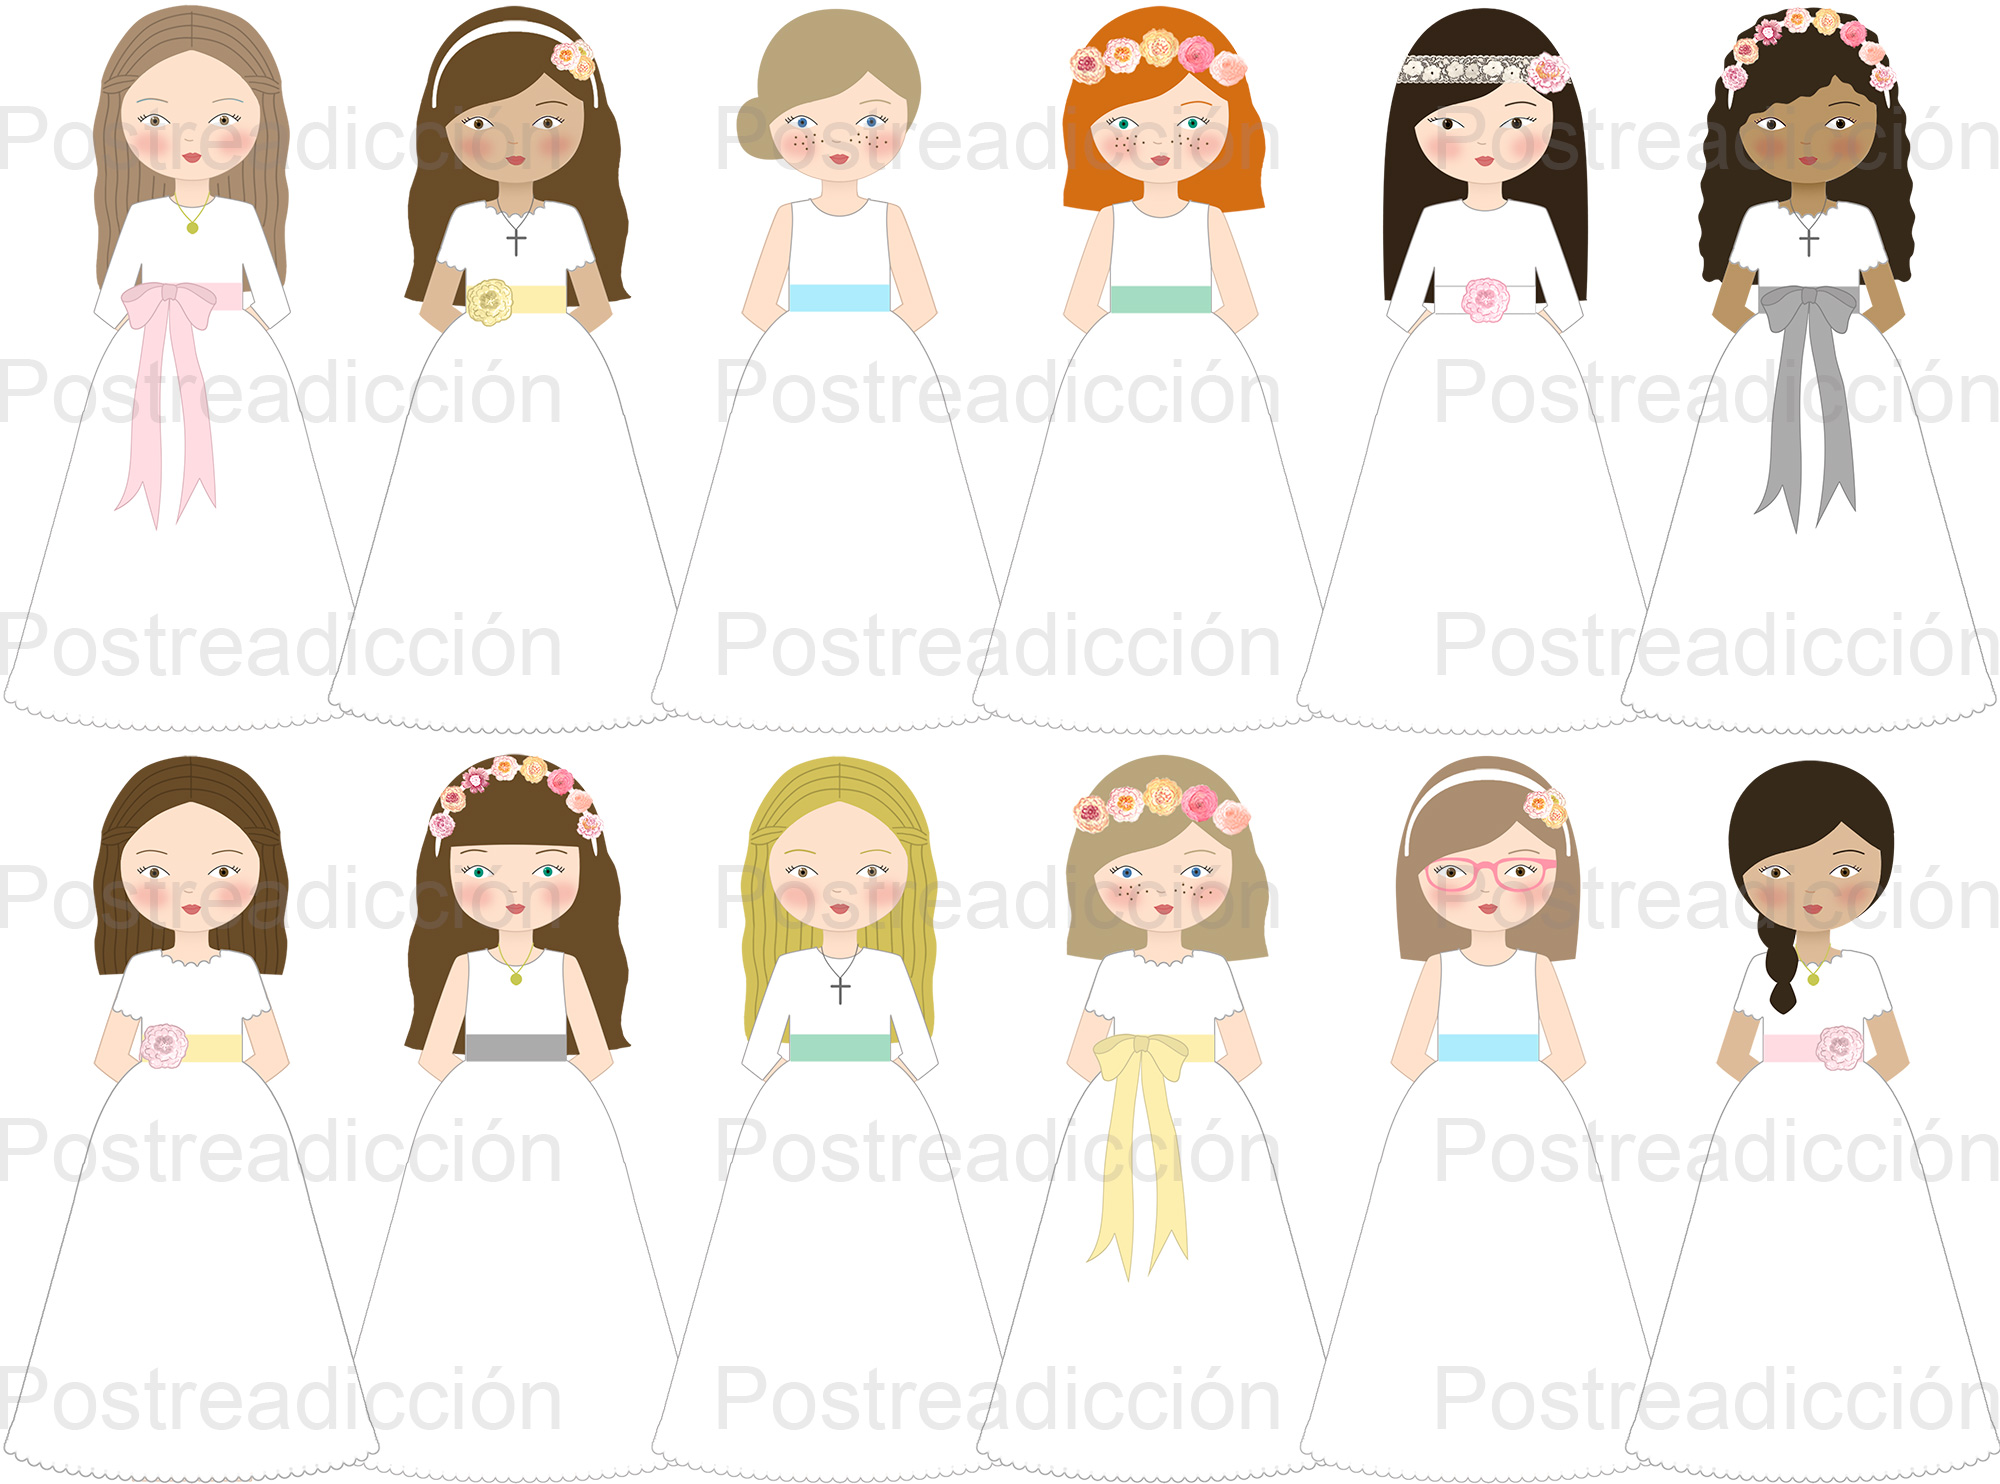 Imagen de producto: https://tienda.postreadiccion.com/img/articulos/secundarias6758-15-toppers-de-comunion-carlota-modelo-no-849-1.jpg